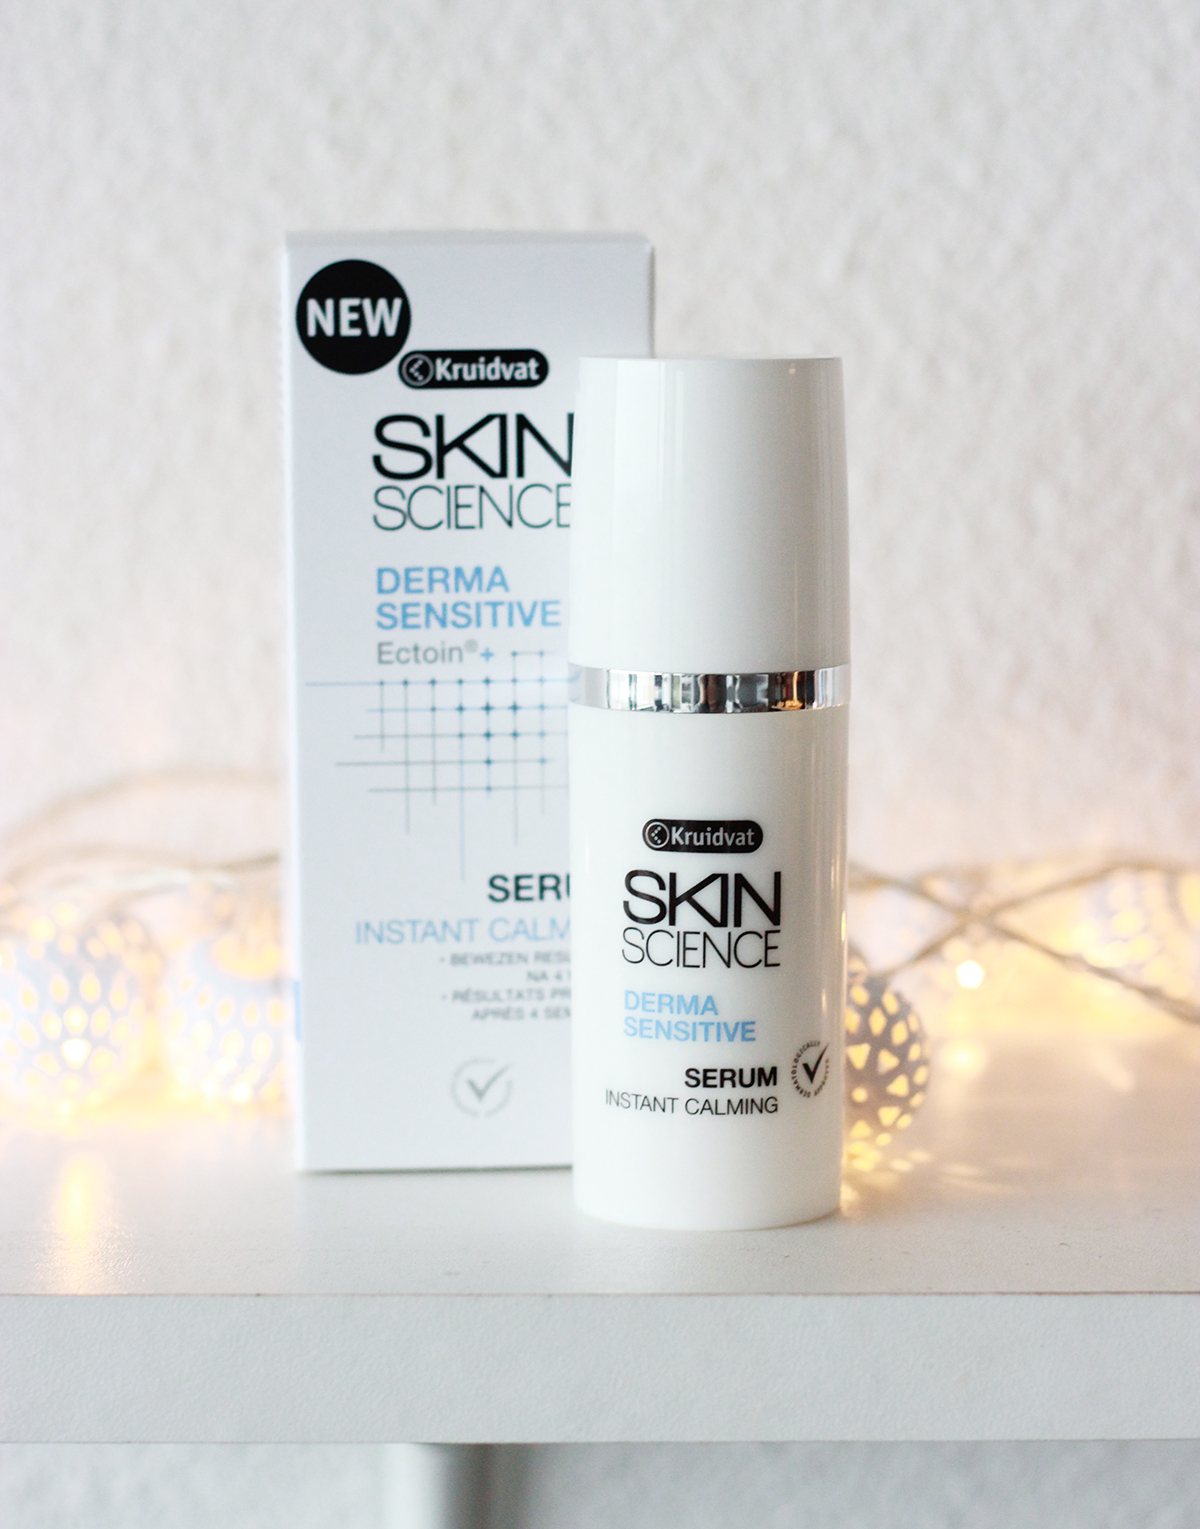 Kruidvat Skin Science Instant Calming Serum review